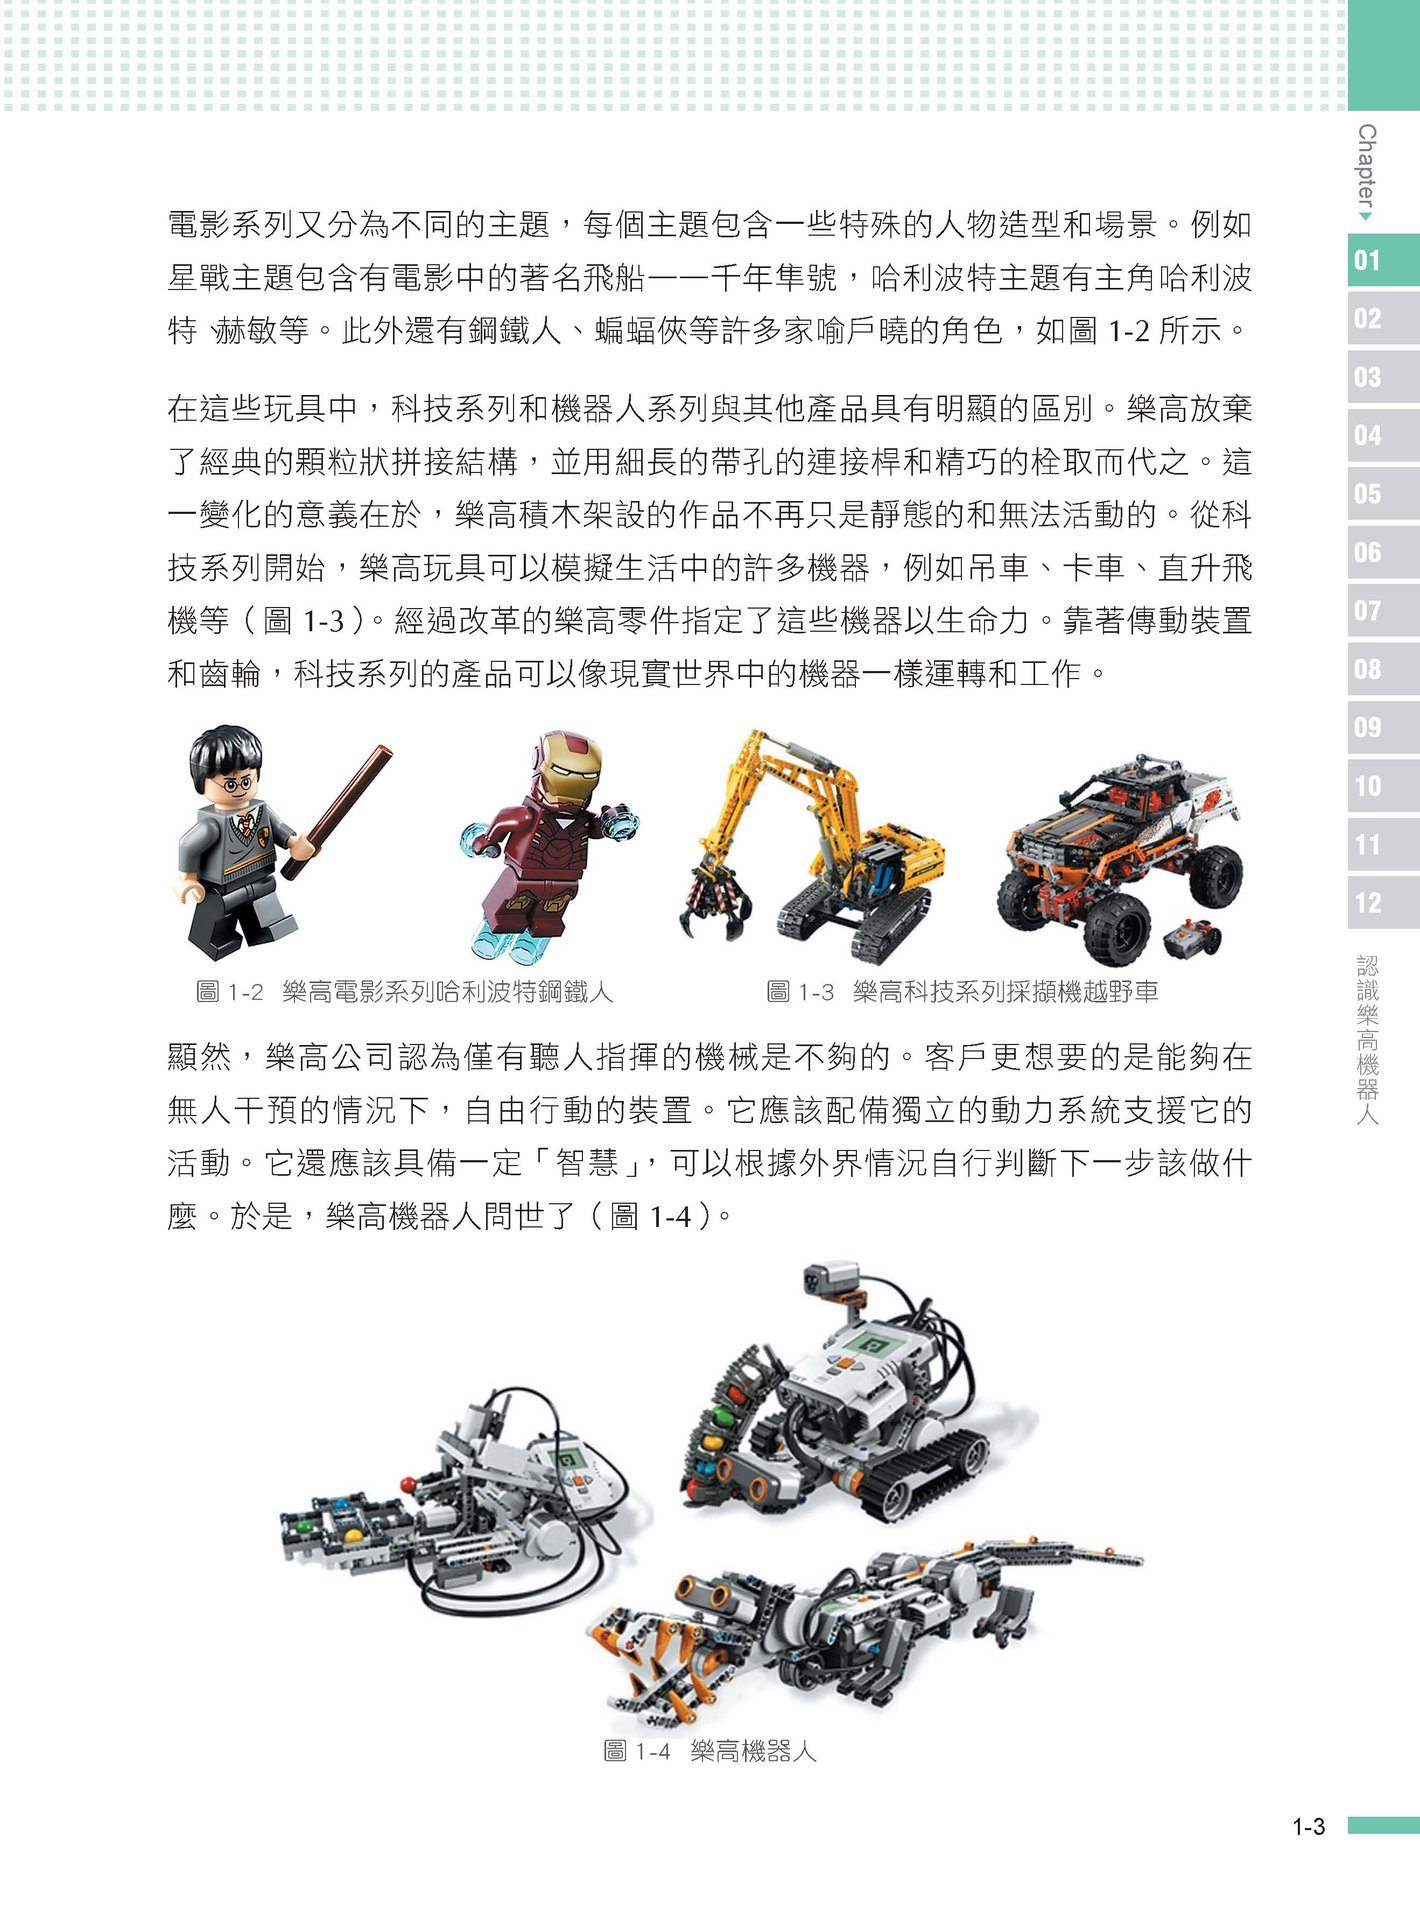 Java 與樂高機器人的完美 CP組合 (舊版: Maker 時代也不缺席 : 樂高機器人和 JAVA的完美組合)-preview-8